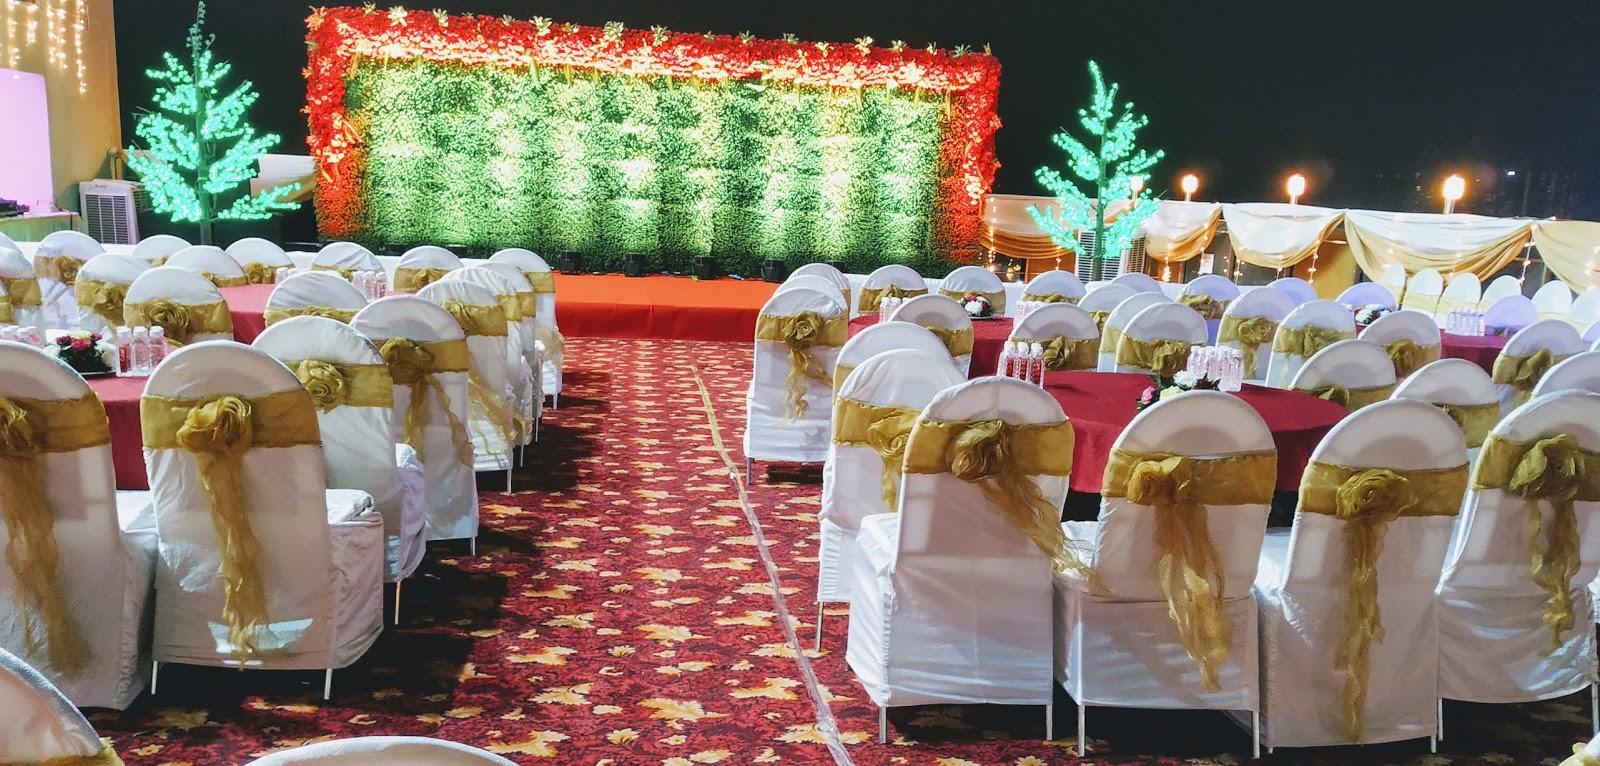 No 1 Banquet Marriage Hall In Navi Mumbai Thane